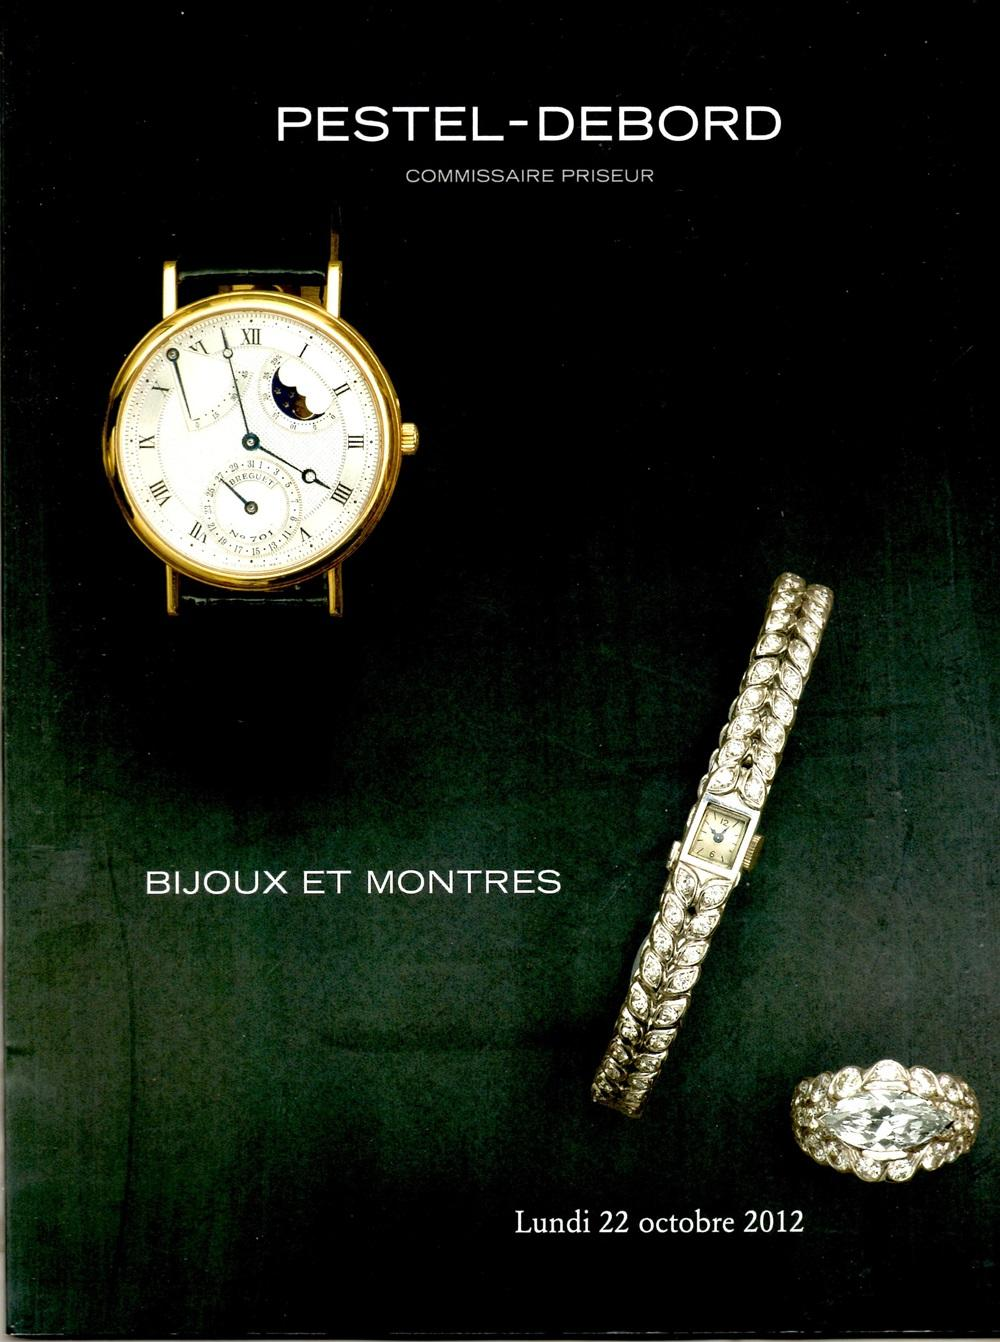 Bijoux Et Illustration Et Abebooks Design Illustration Bijoux 4L3Aj5Rq